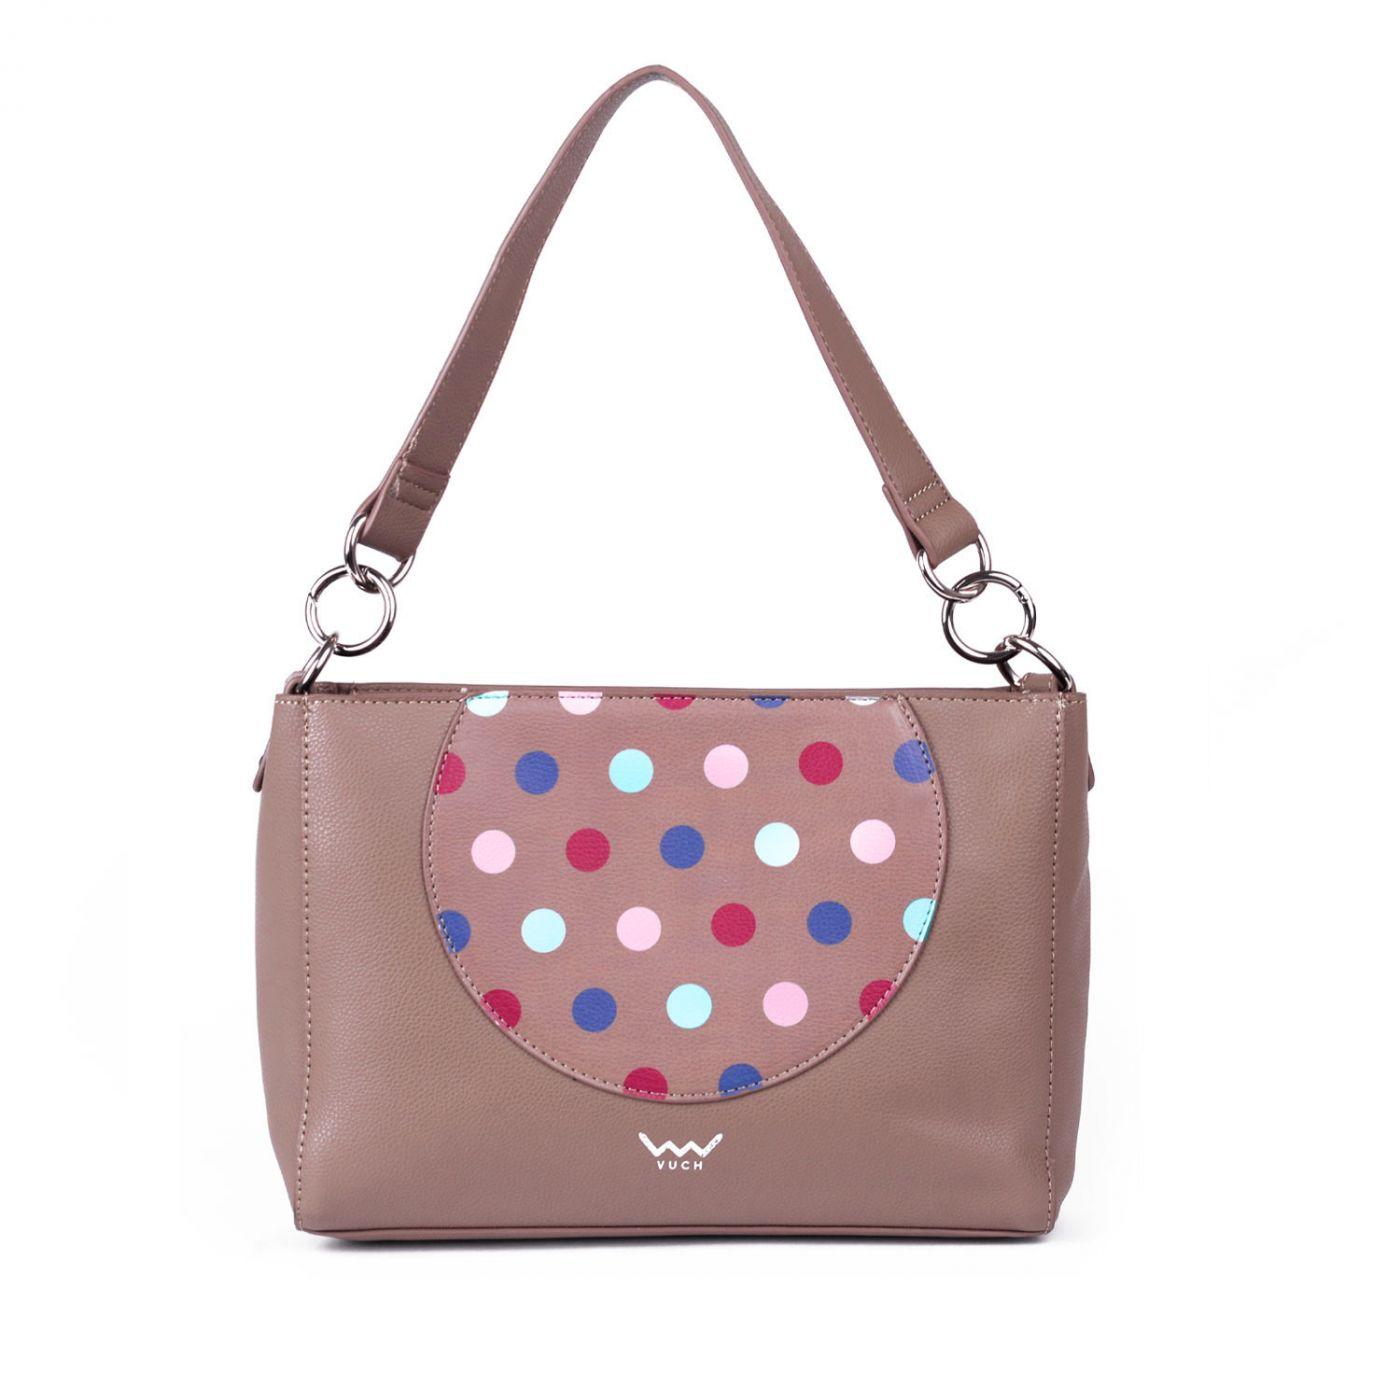 Women's handbag VUCH Moonlight Collection